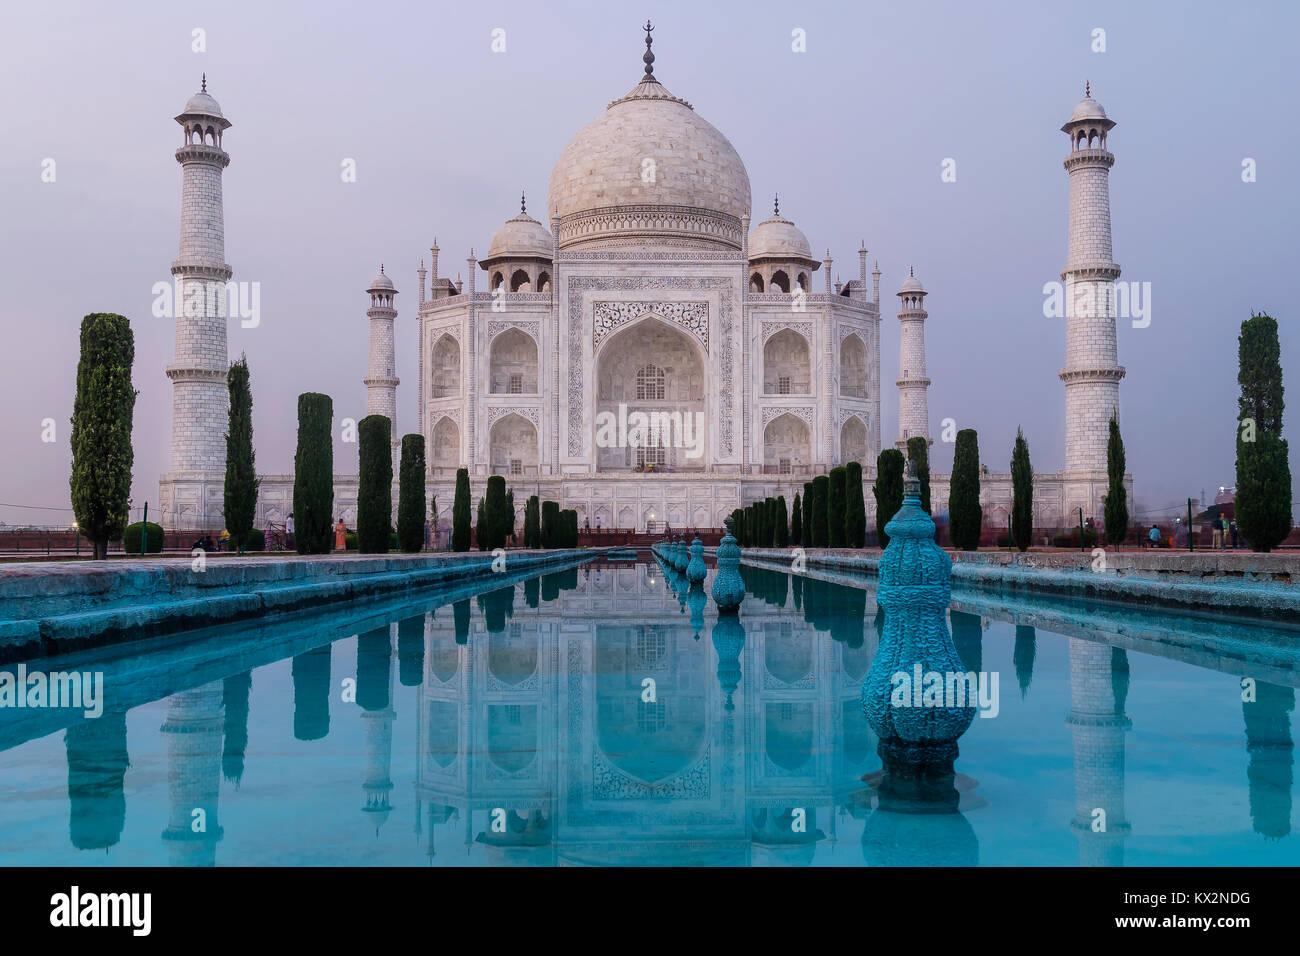 Taj Mahal im Abendlicht, Agra, Uttar Pradesh, Indien Stockbild